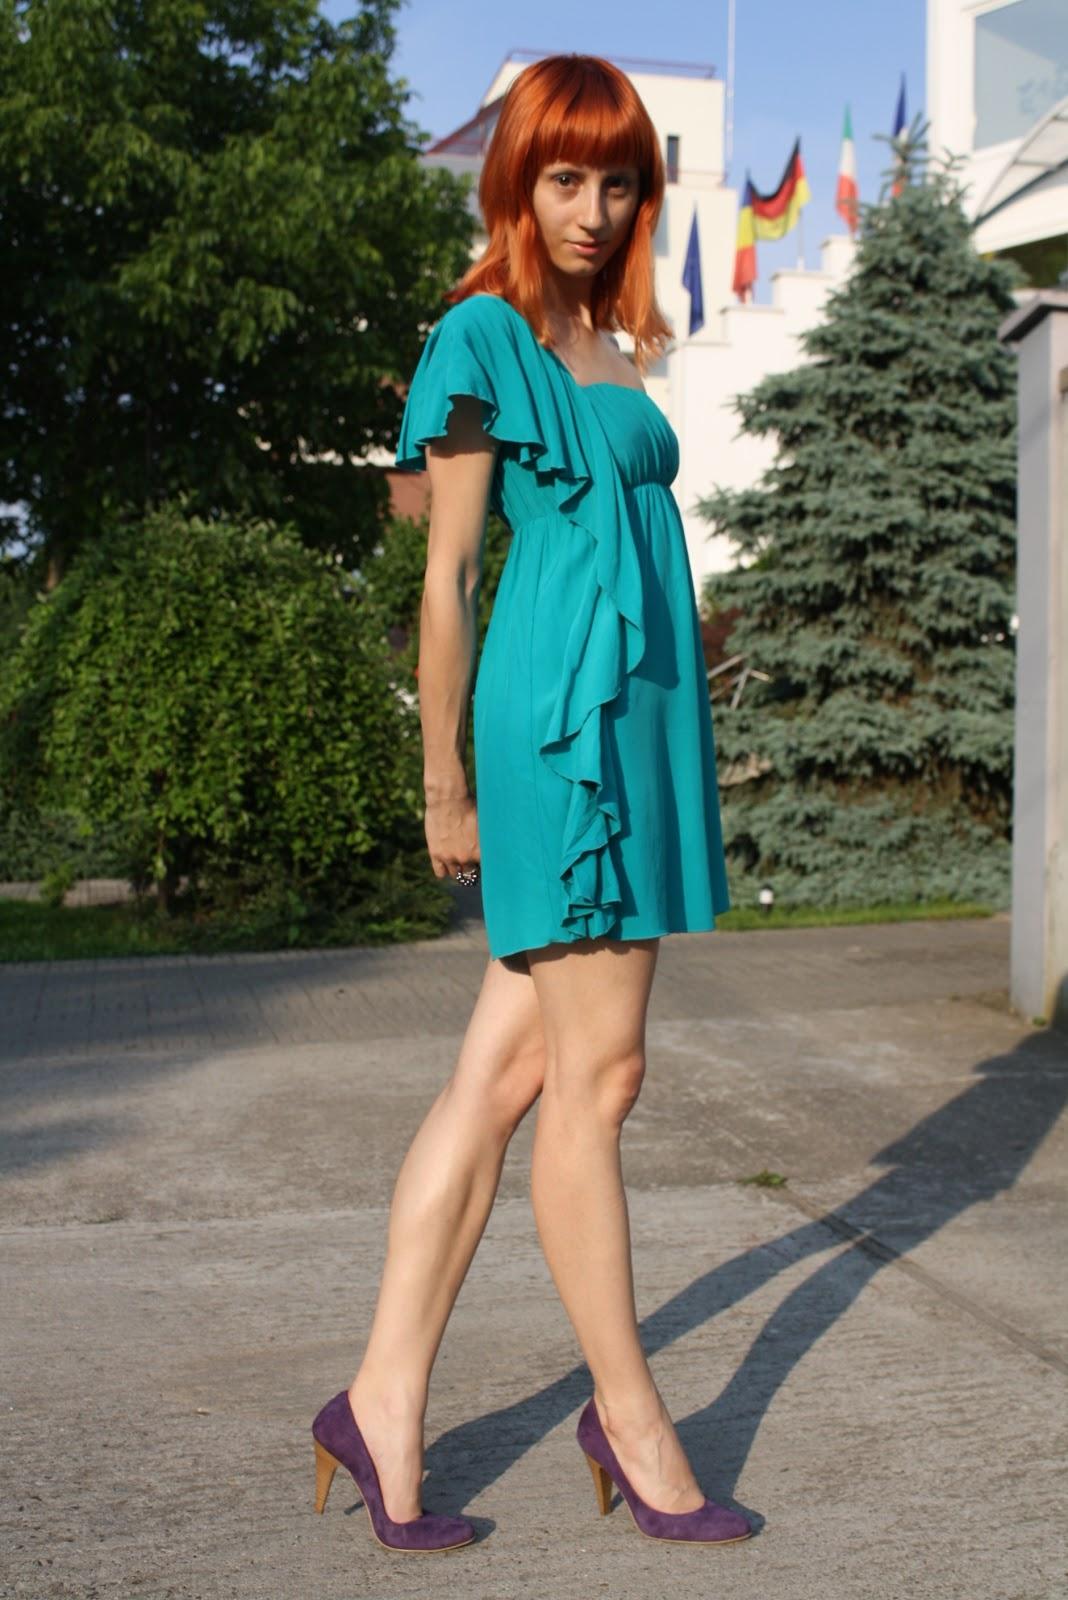 Teal Dress Shoes Color